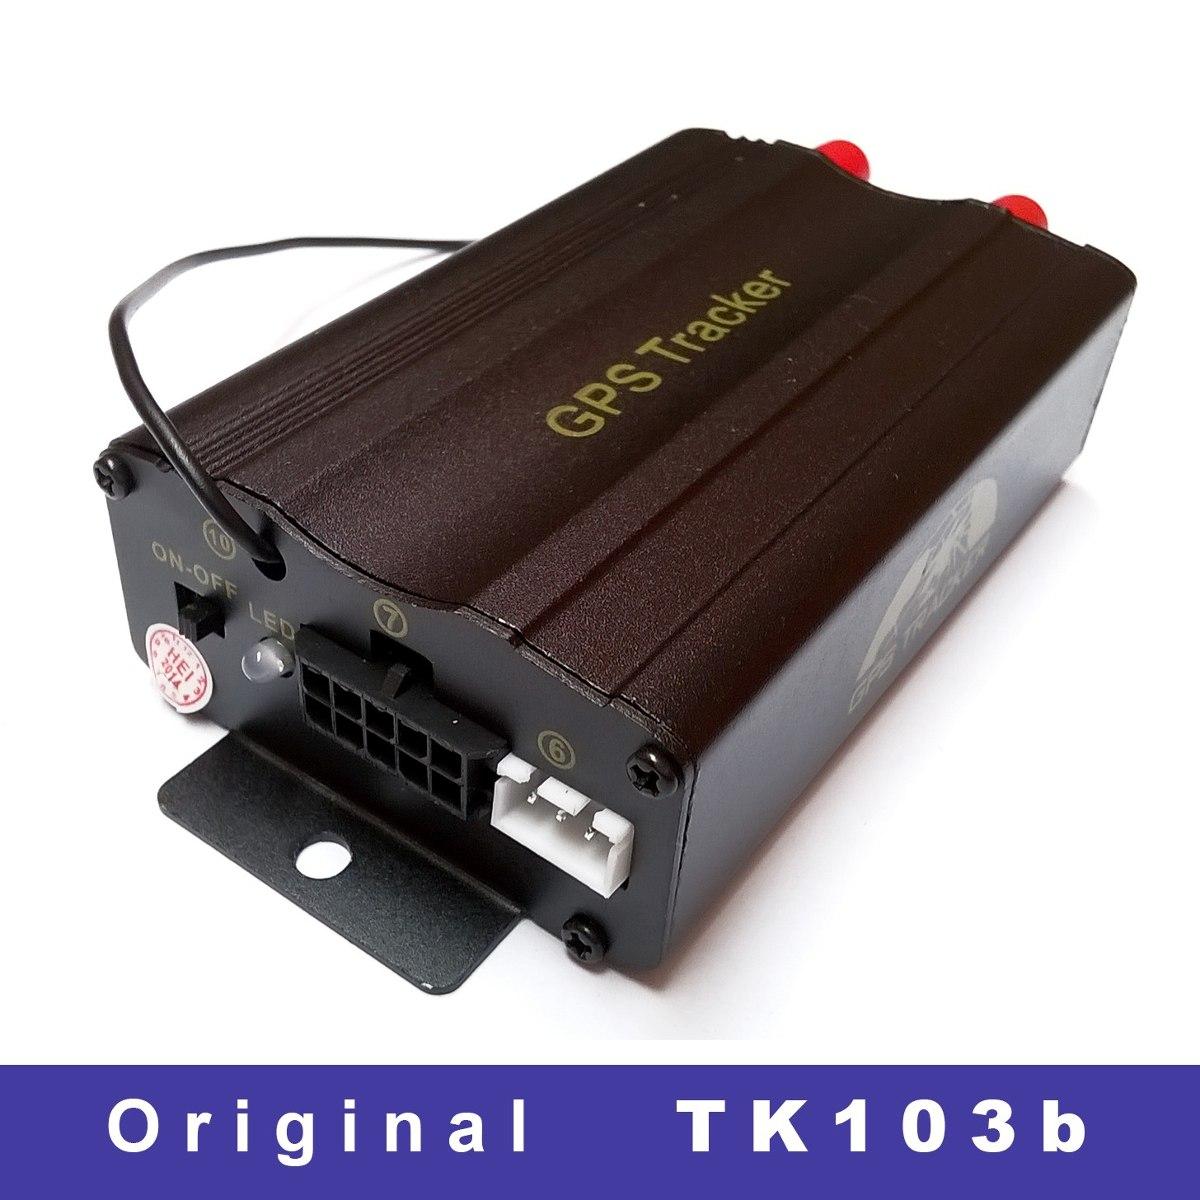 Bloqueador gps | Adjustable 6 Antenna Desktop 6 Bands Cellular Phone Jammer with Remote Control GPS Lojack